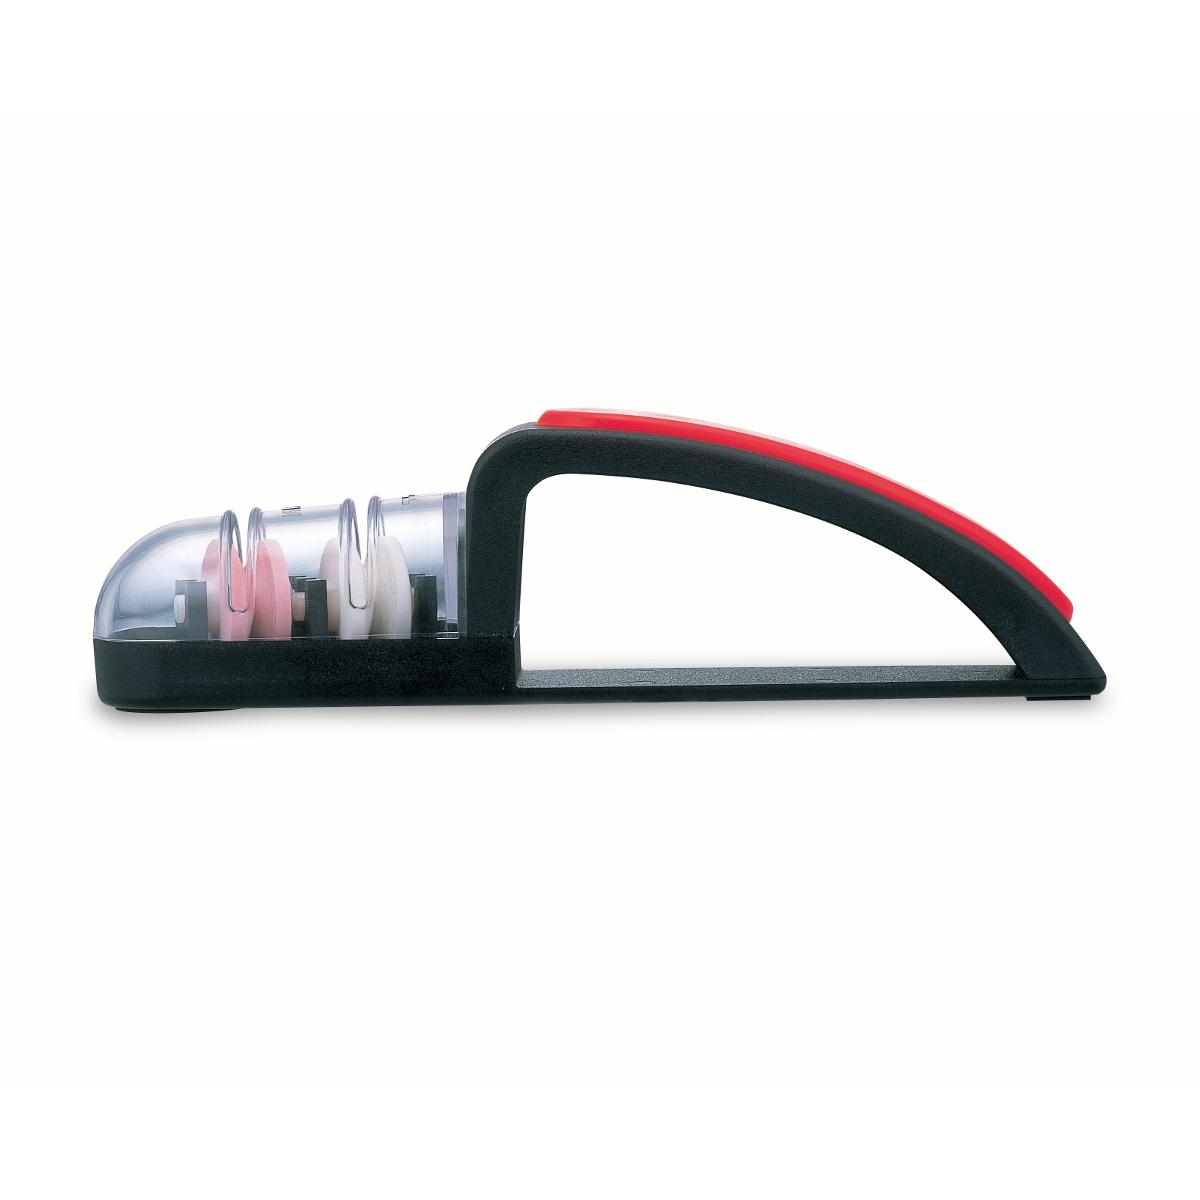 Global MINOSHARP Plus Black and Red Ceramic 2 Stage Large Sharpener